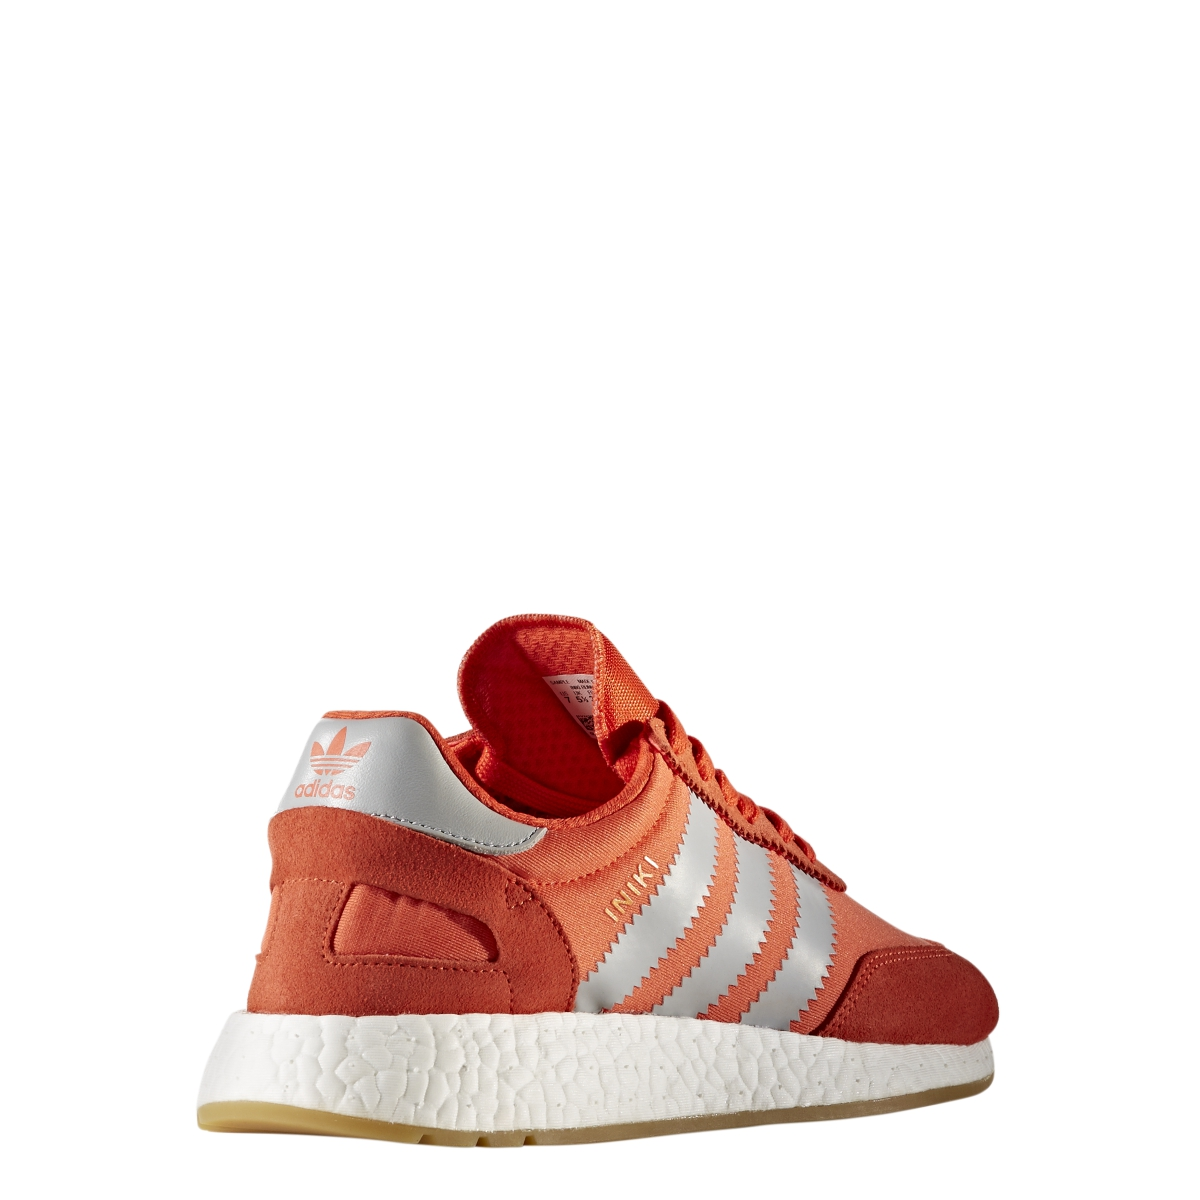 save off 19483 ec7a1 Adidas Iniki Runner for Women in Energy (Orange)